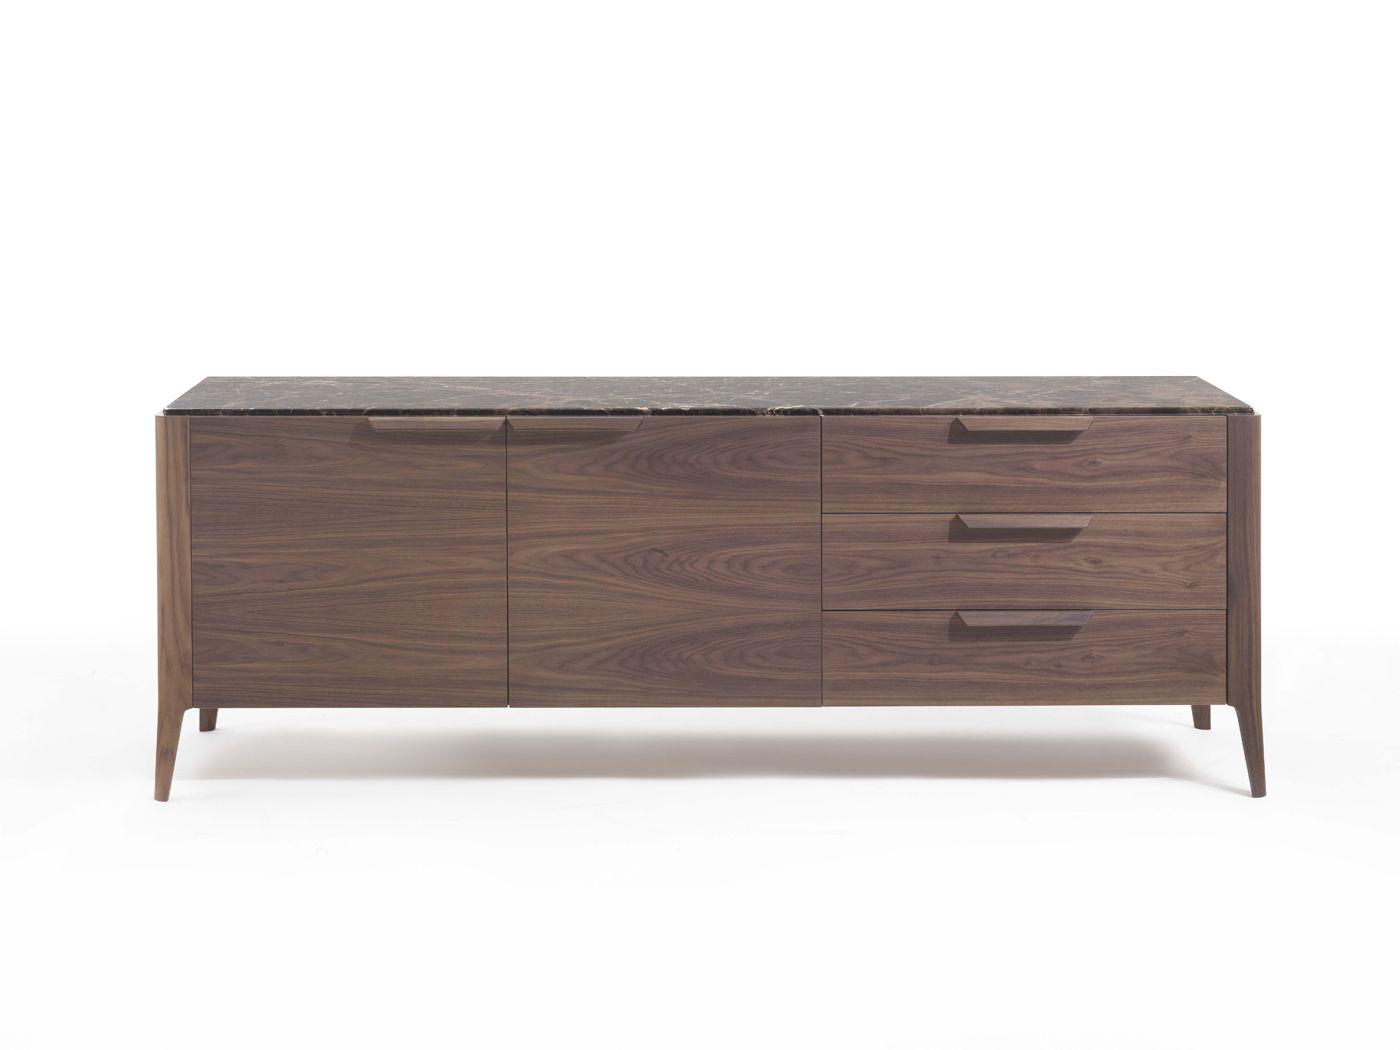 Porada arredi srl porada italy furniture pinterest for Porada arredi srl